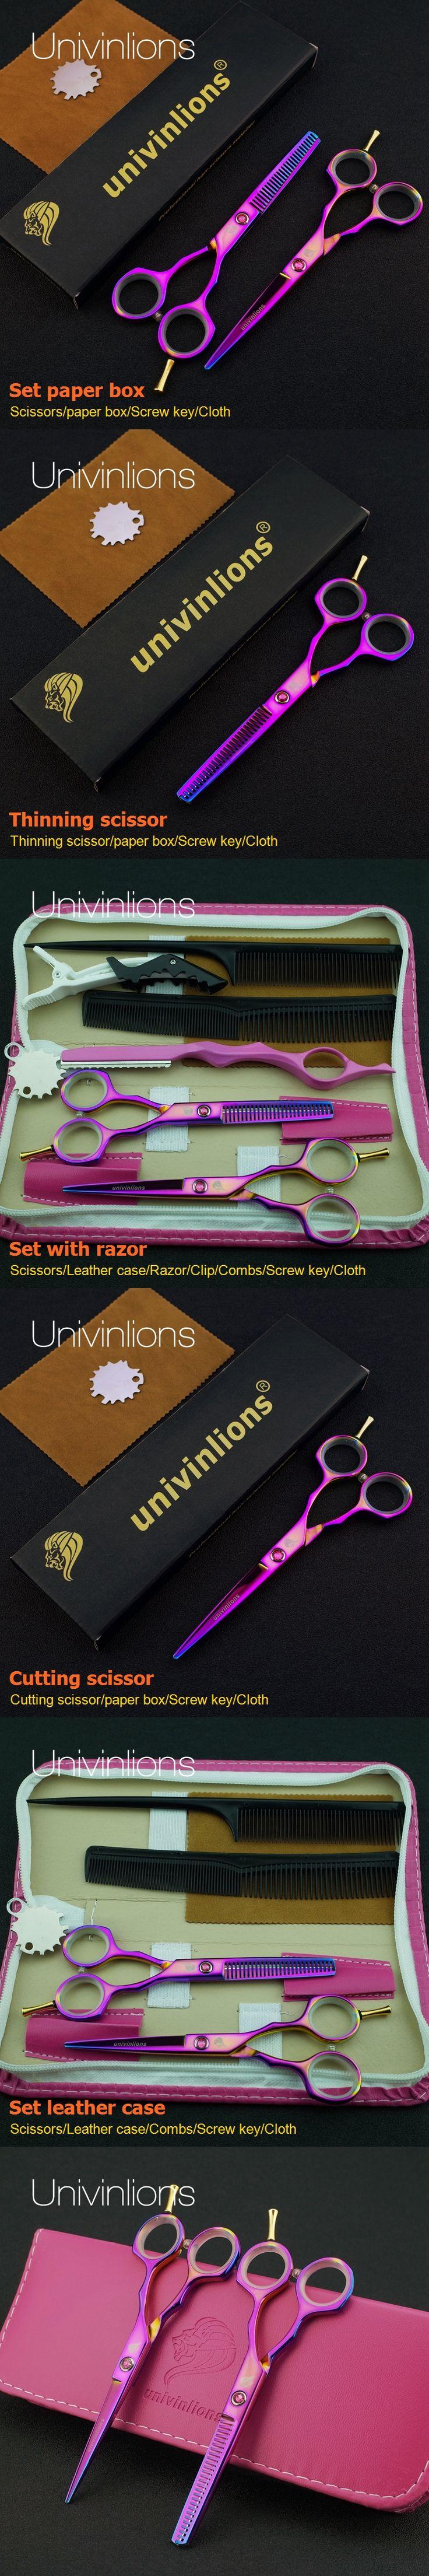 "5.5"" hot sharp rainbow shears titanium hair scissors titan scissors cheap thinning scissors haircutter barber razor edge haircut"